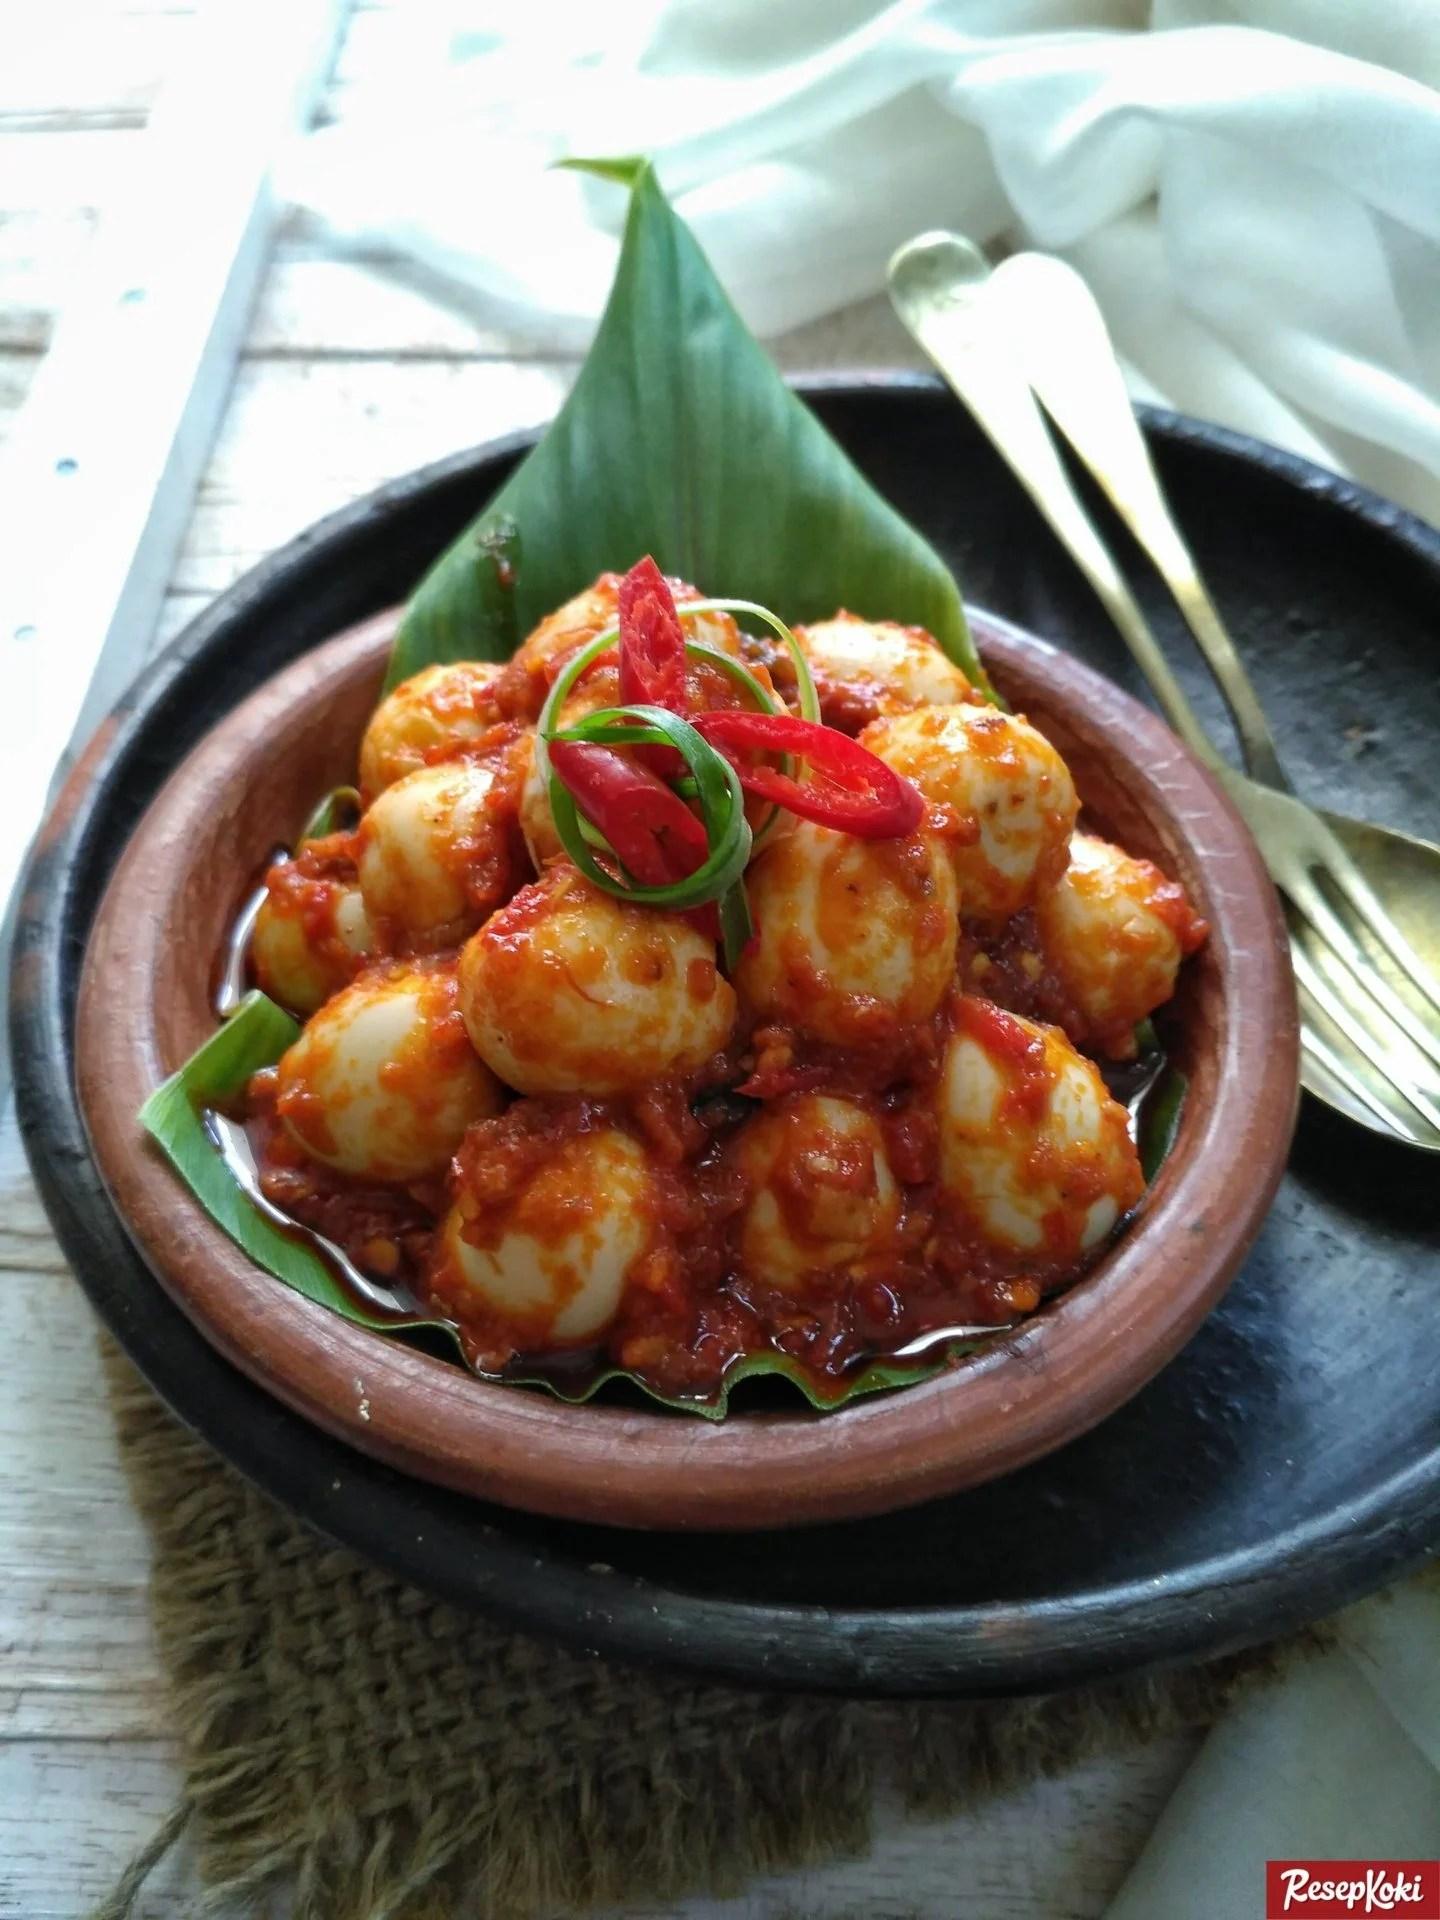 Resep Masak Telur Balado : resep, masak, telur, balado, Telur, Puyuh, Balado, Pedas, Lezat, Resep, ResepKoki